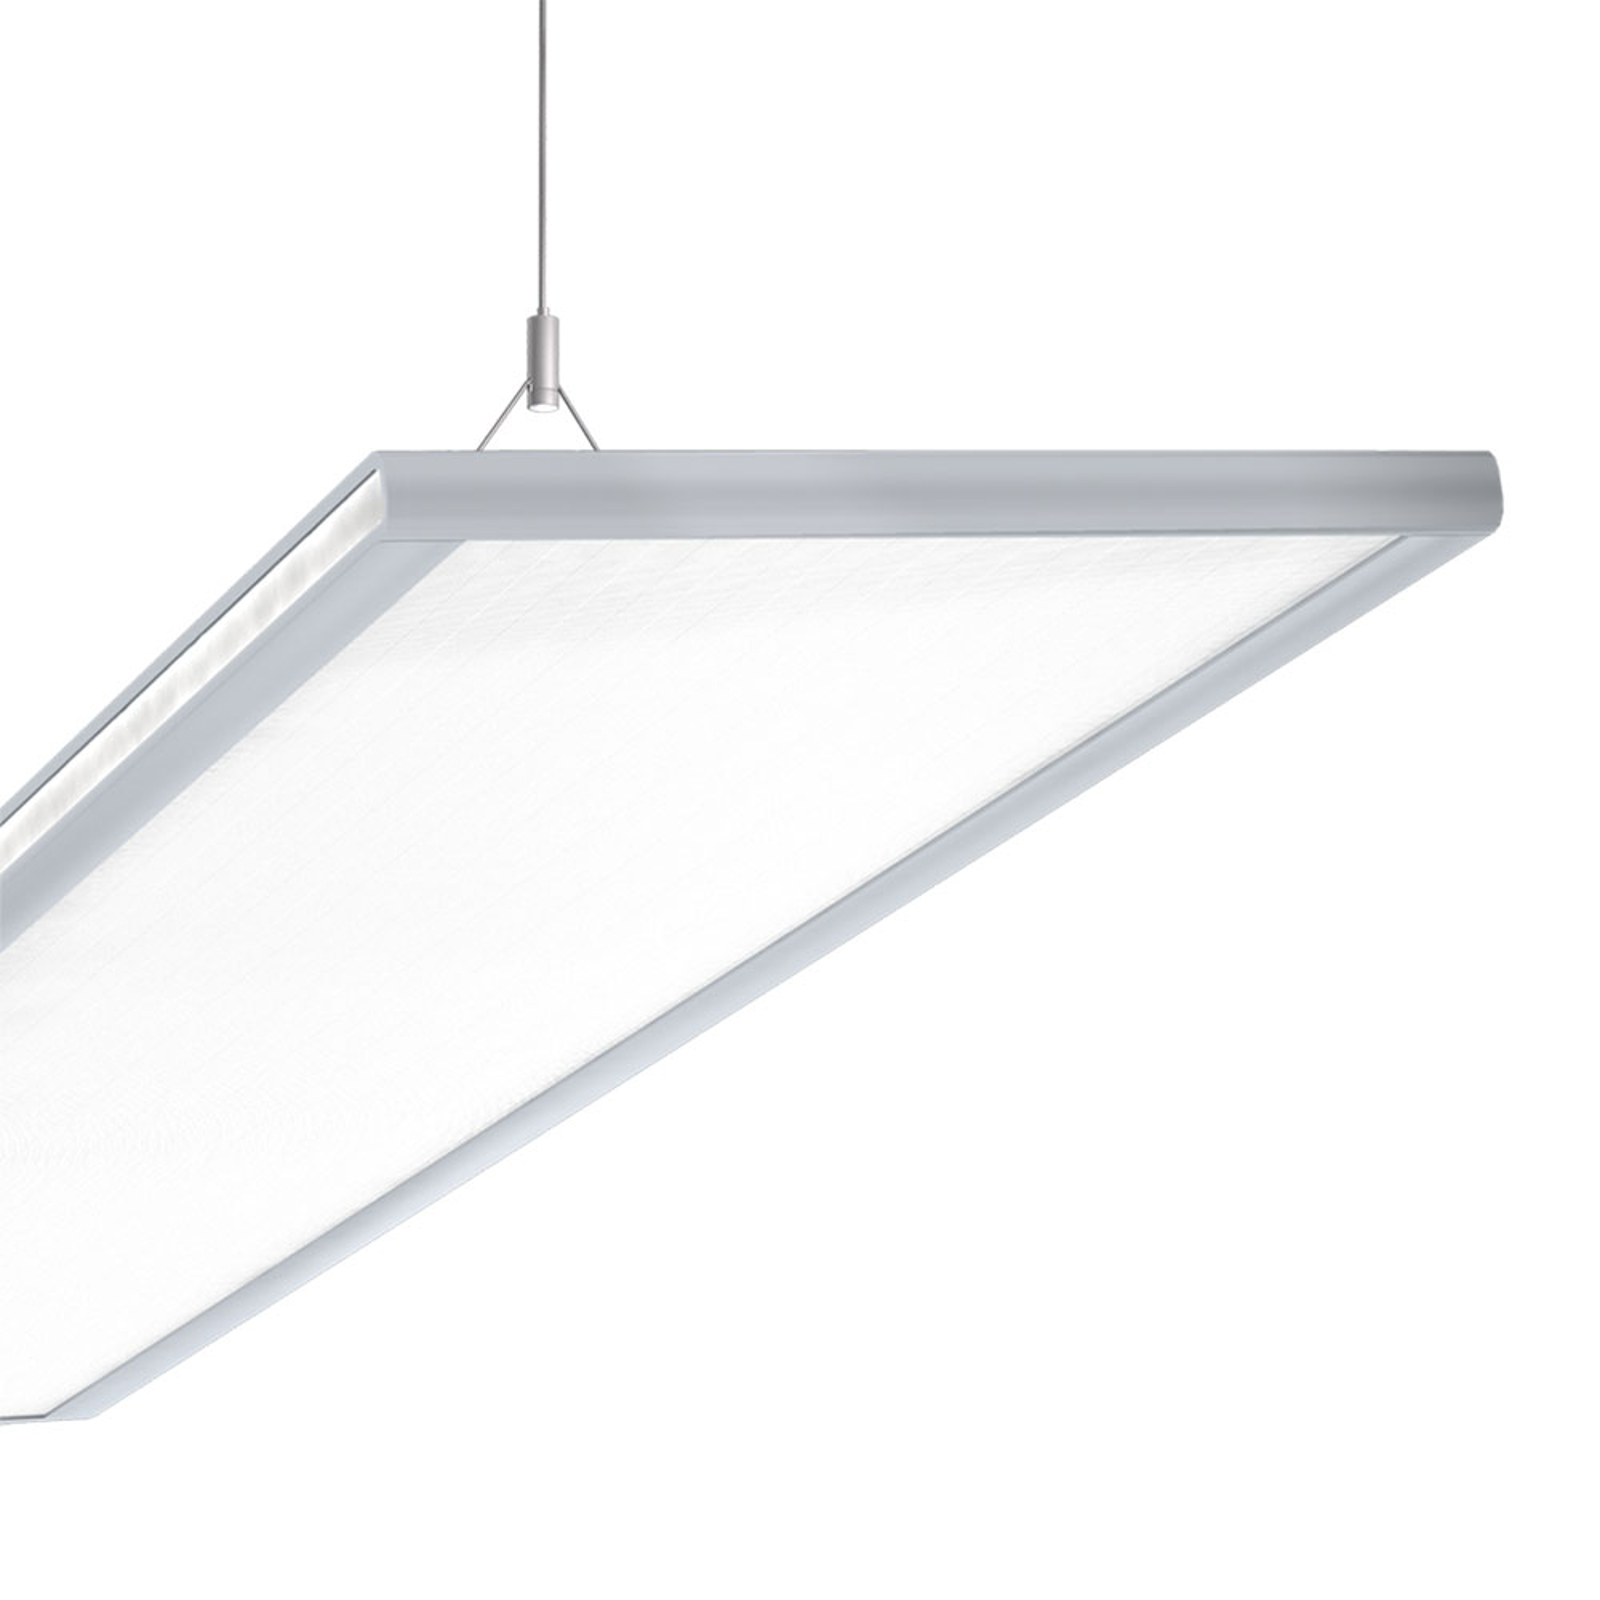 Suspension LED alvia 139cm 9205lm 4000K DALI